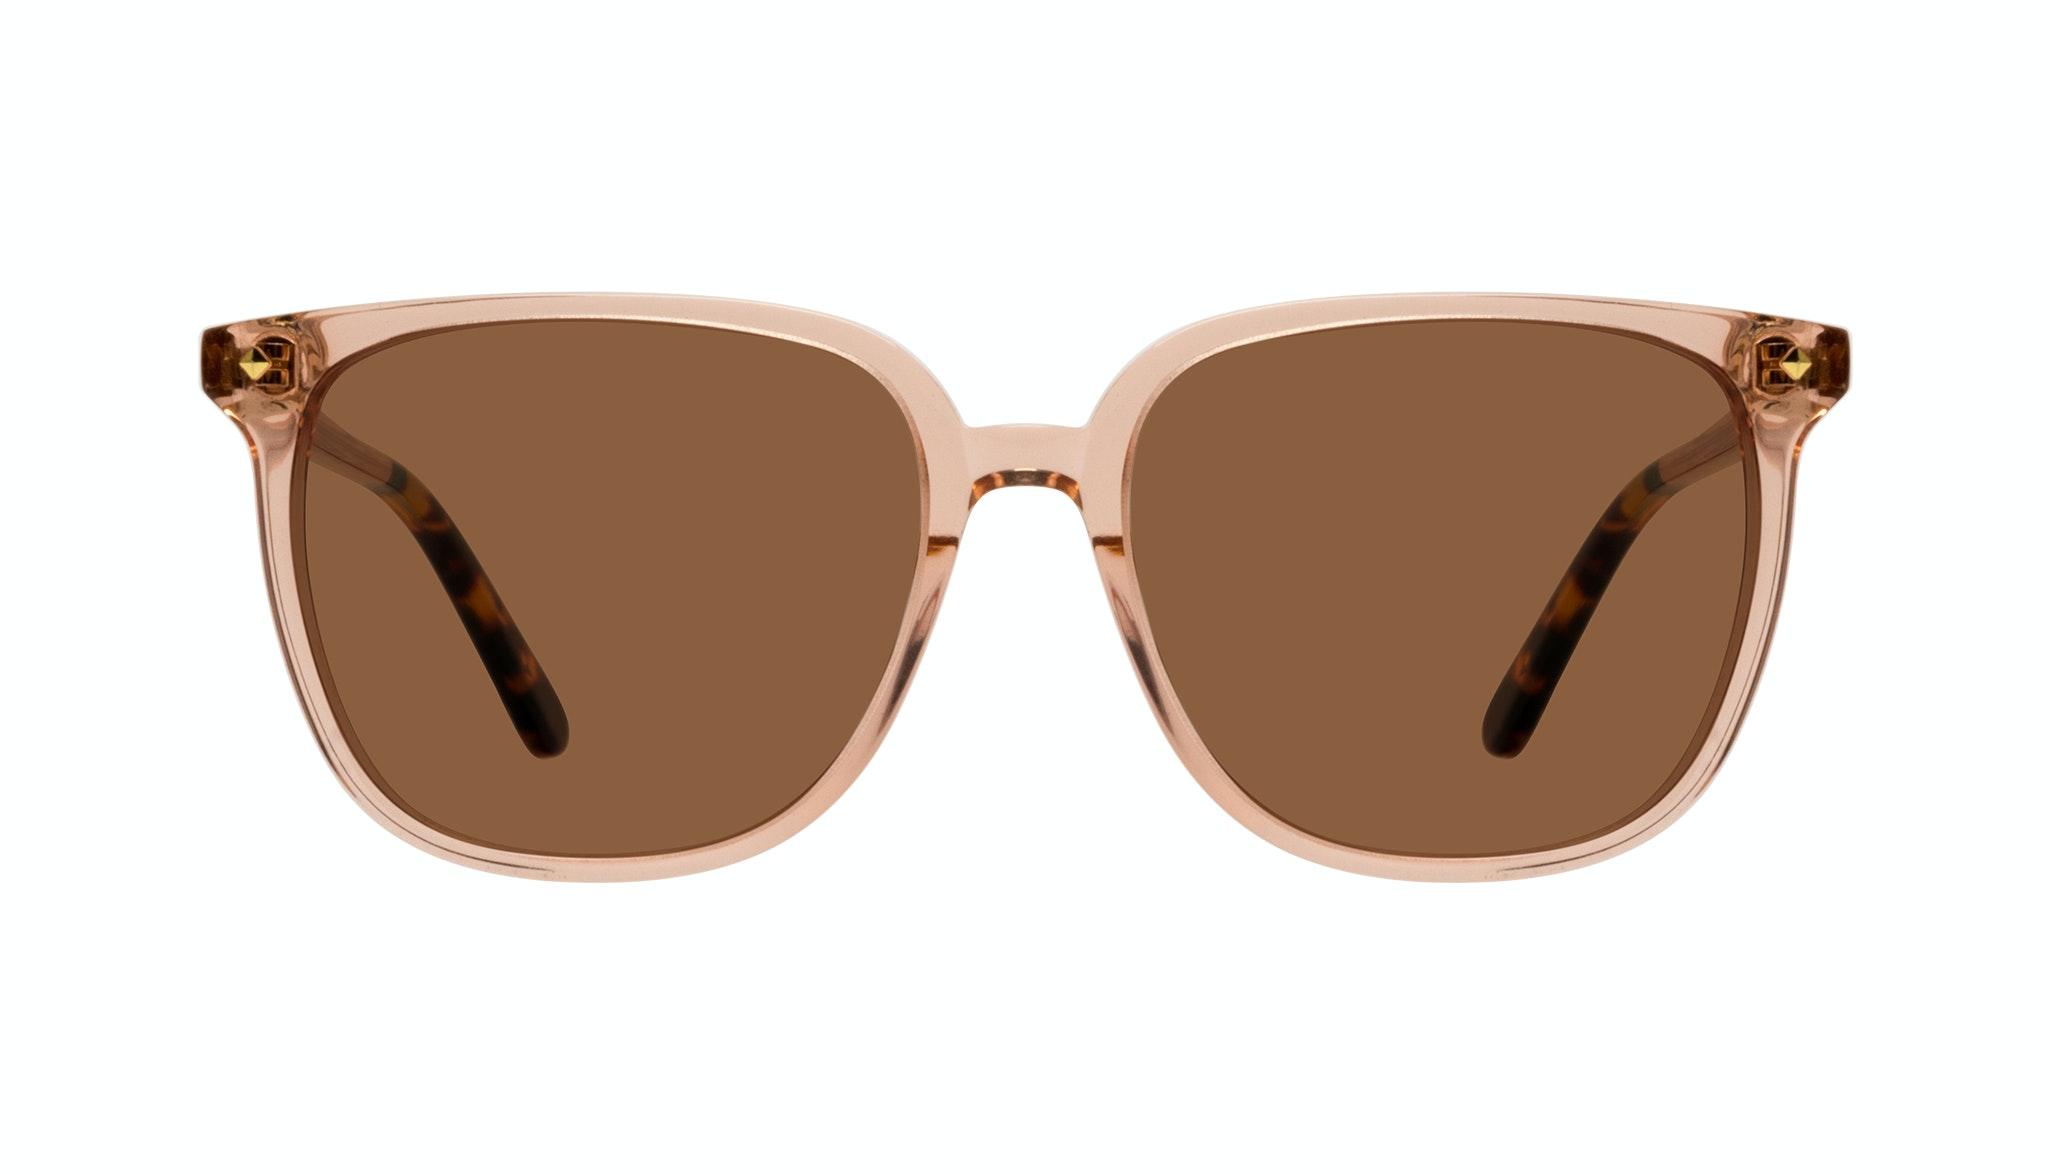 Affordable Fashion Glasses Cat Eye Sunglasses Women Gia Peach